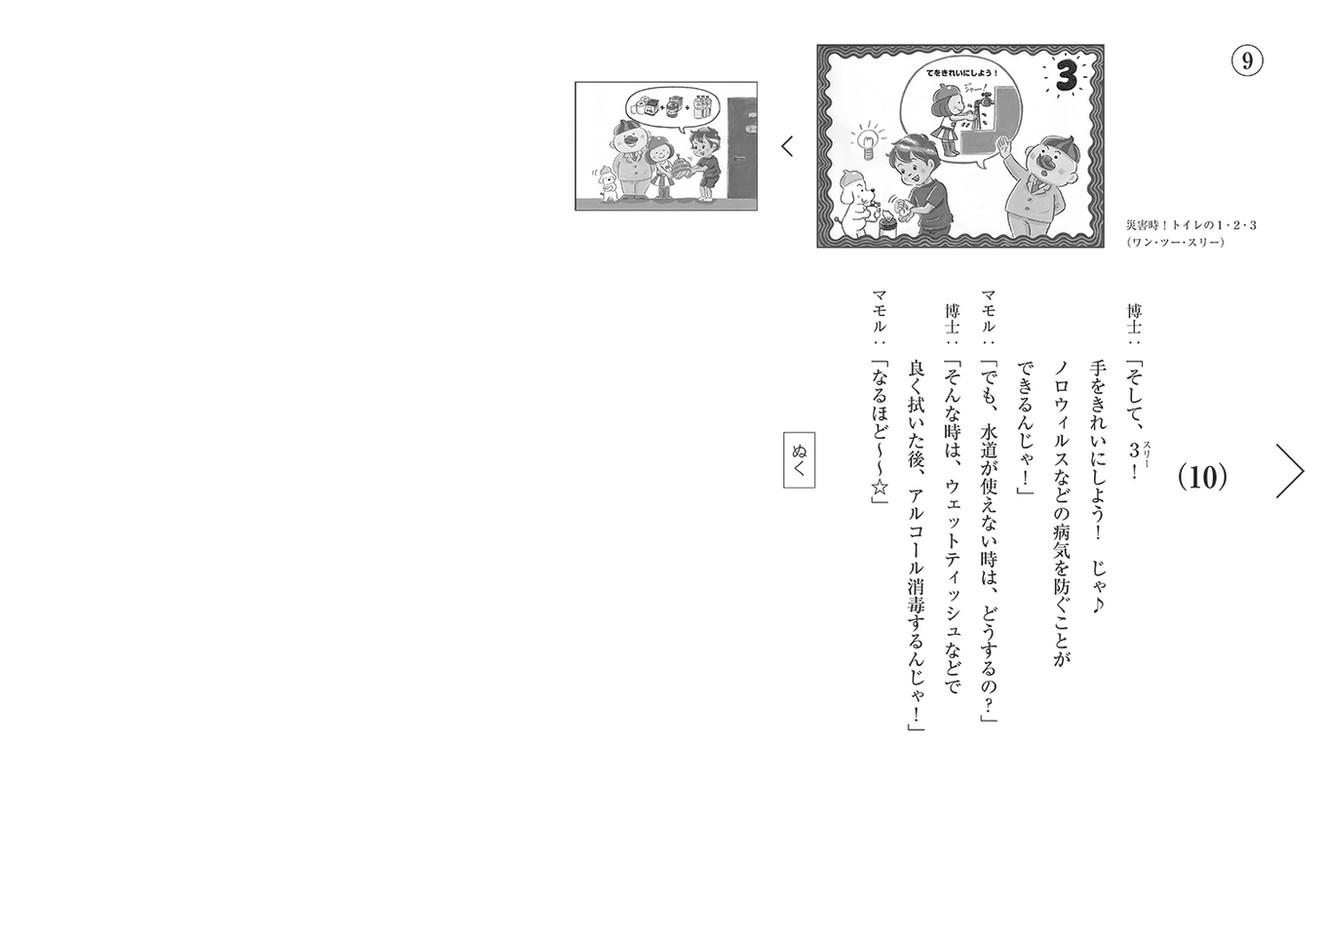 kanaweb_toiletkamishibai_020.jpg